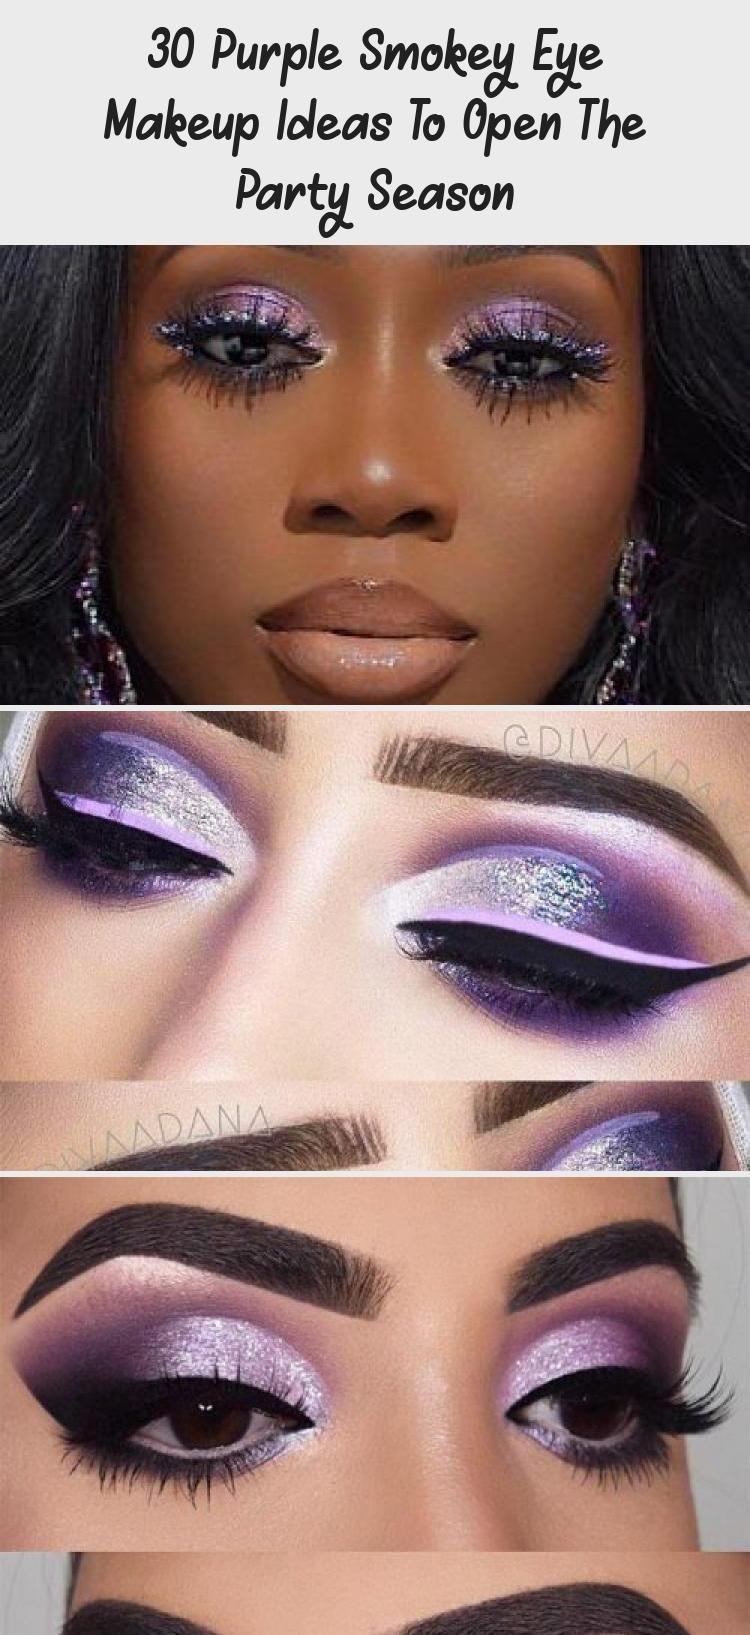 Dekoration İdeen in 2020 Eye makeup, Smokey eye makeup